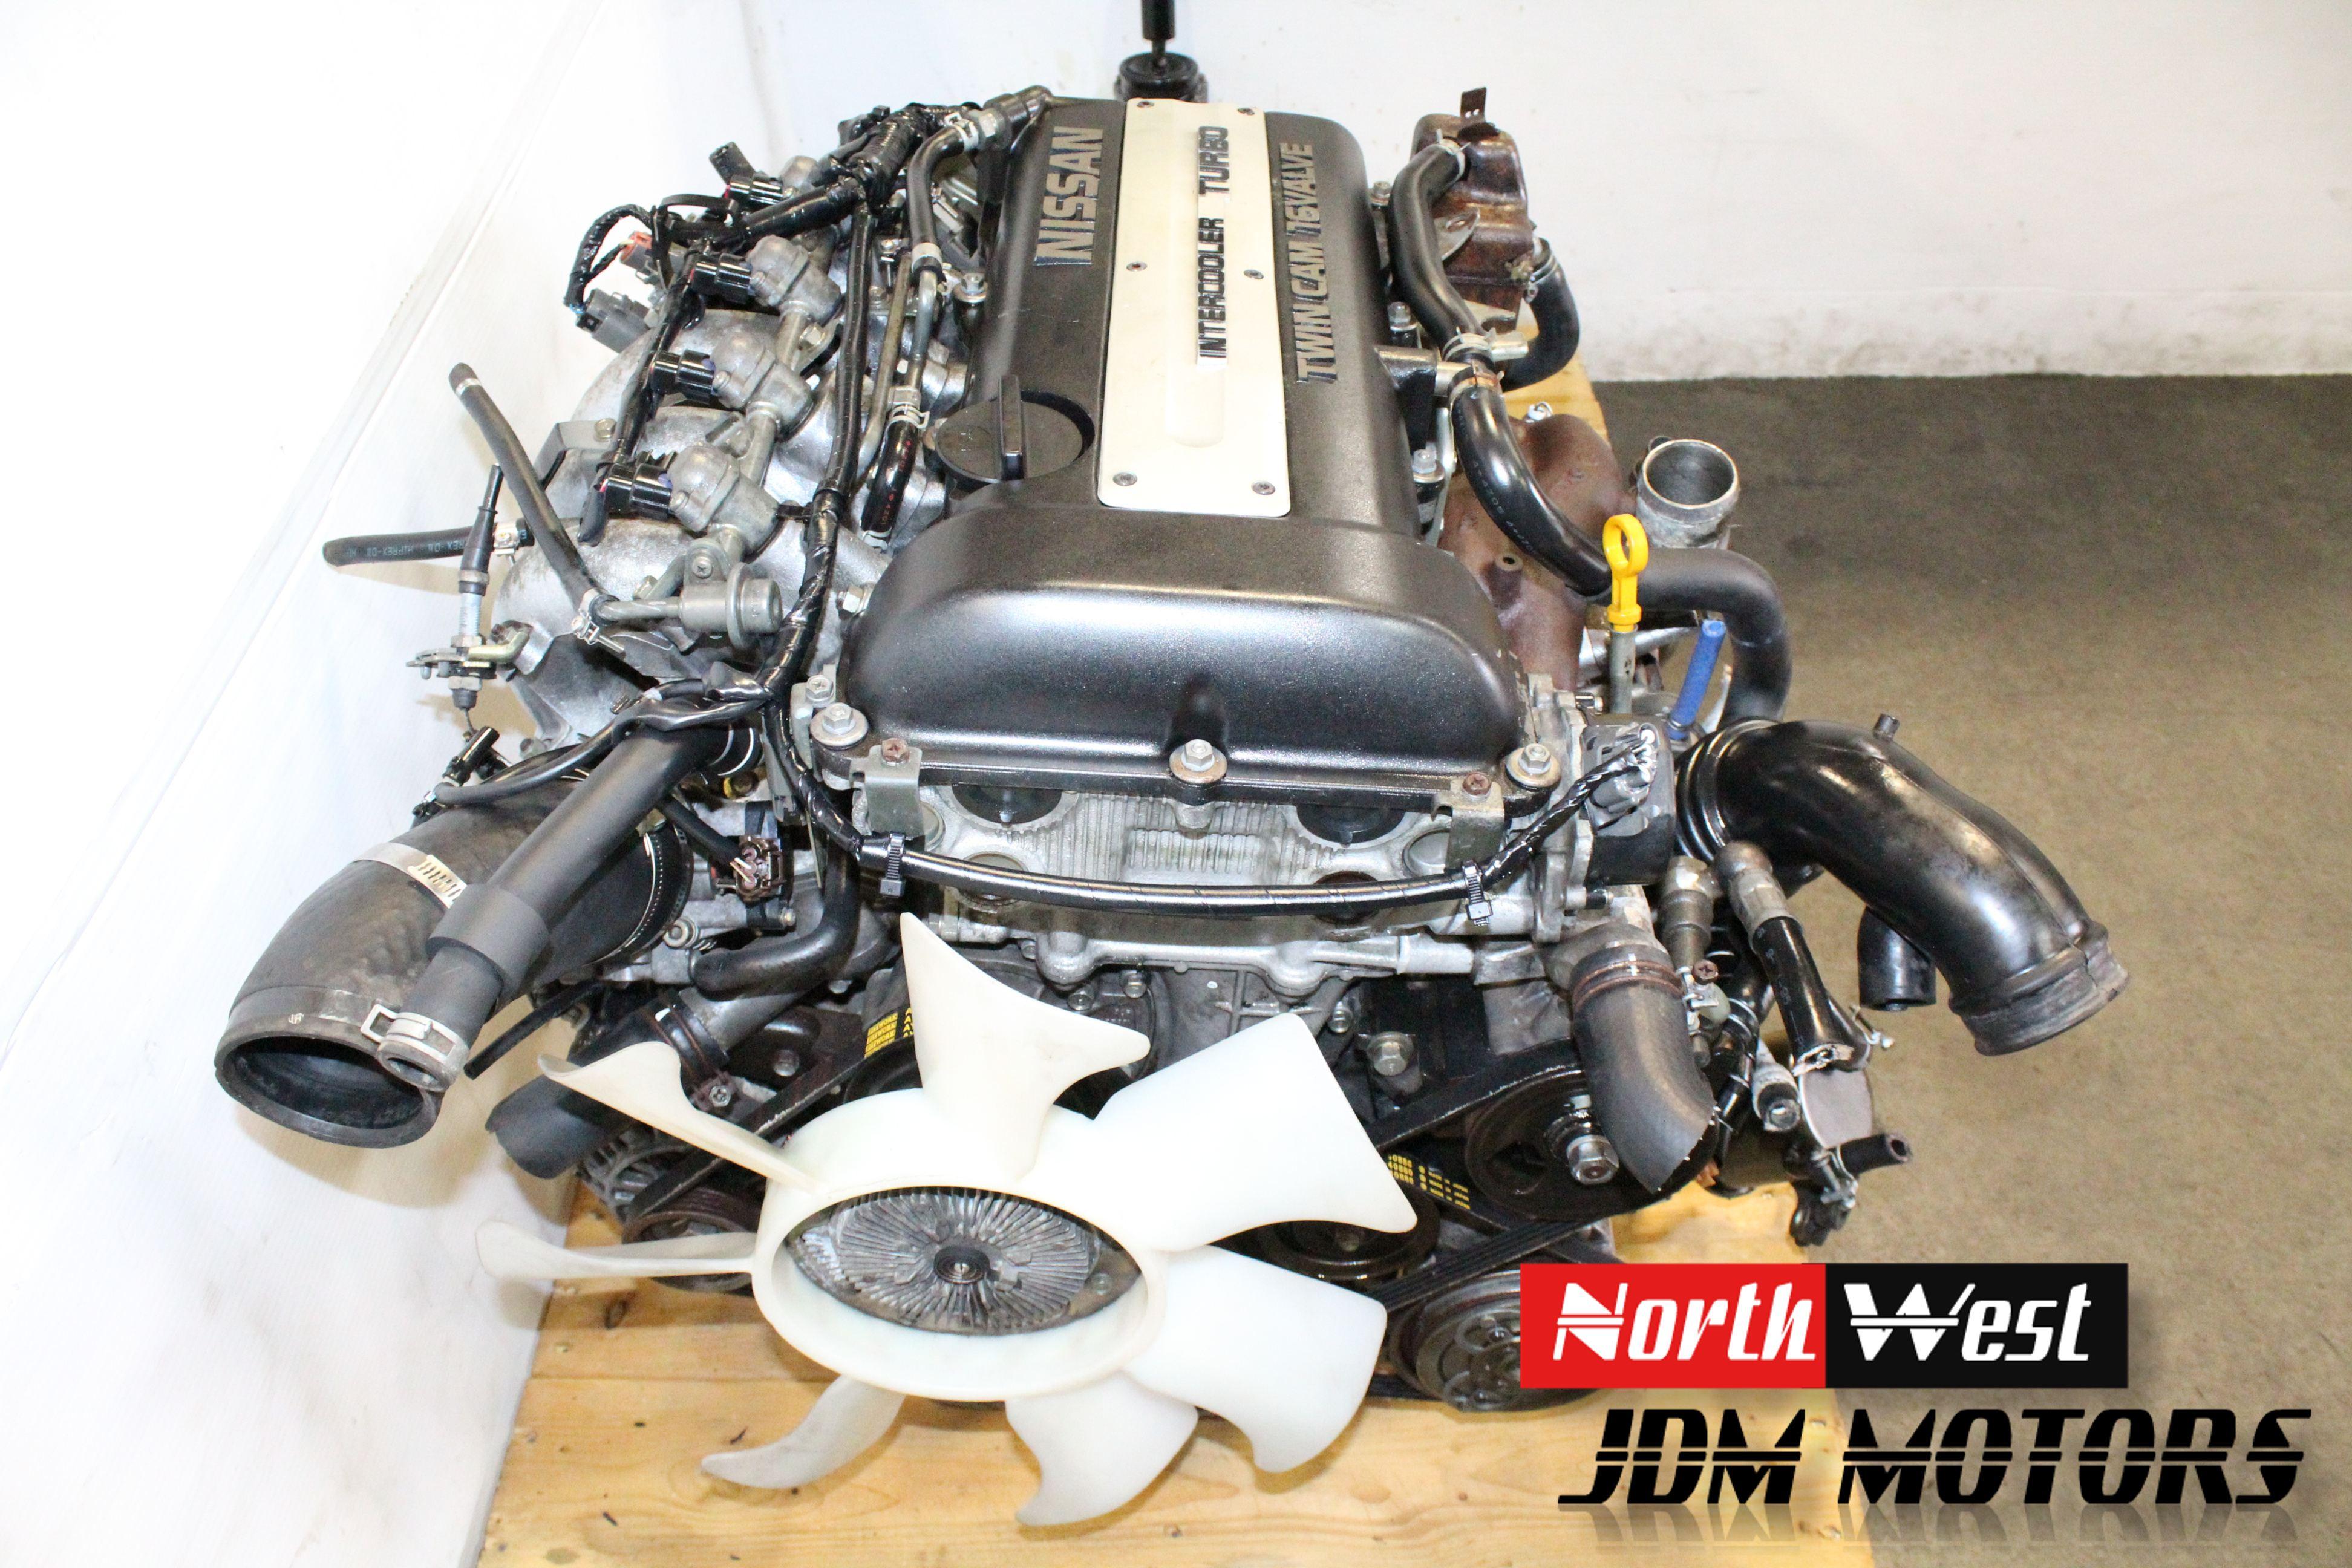 Jdm Nissan Sr20det Engine 5 Speed S13 Sr20 Turbo 180sx Silvia 240sx Japanese Car Parts